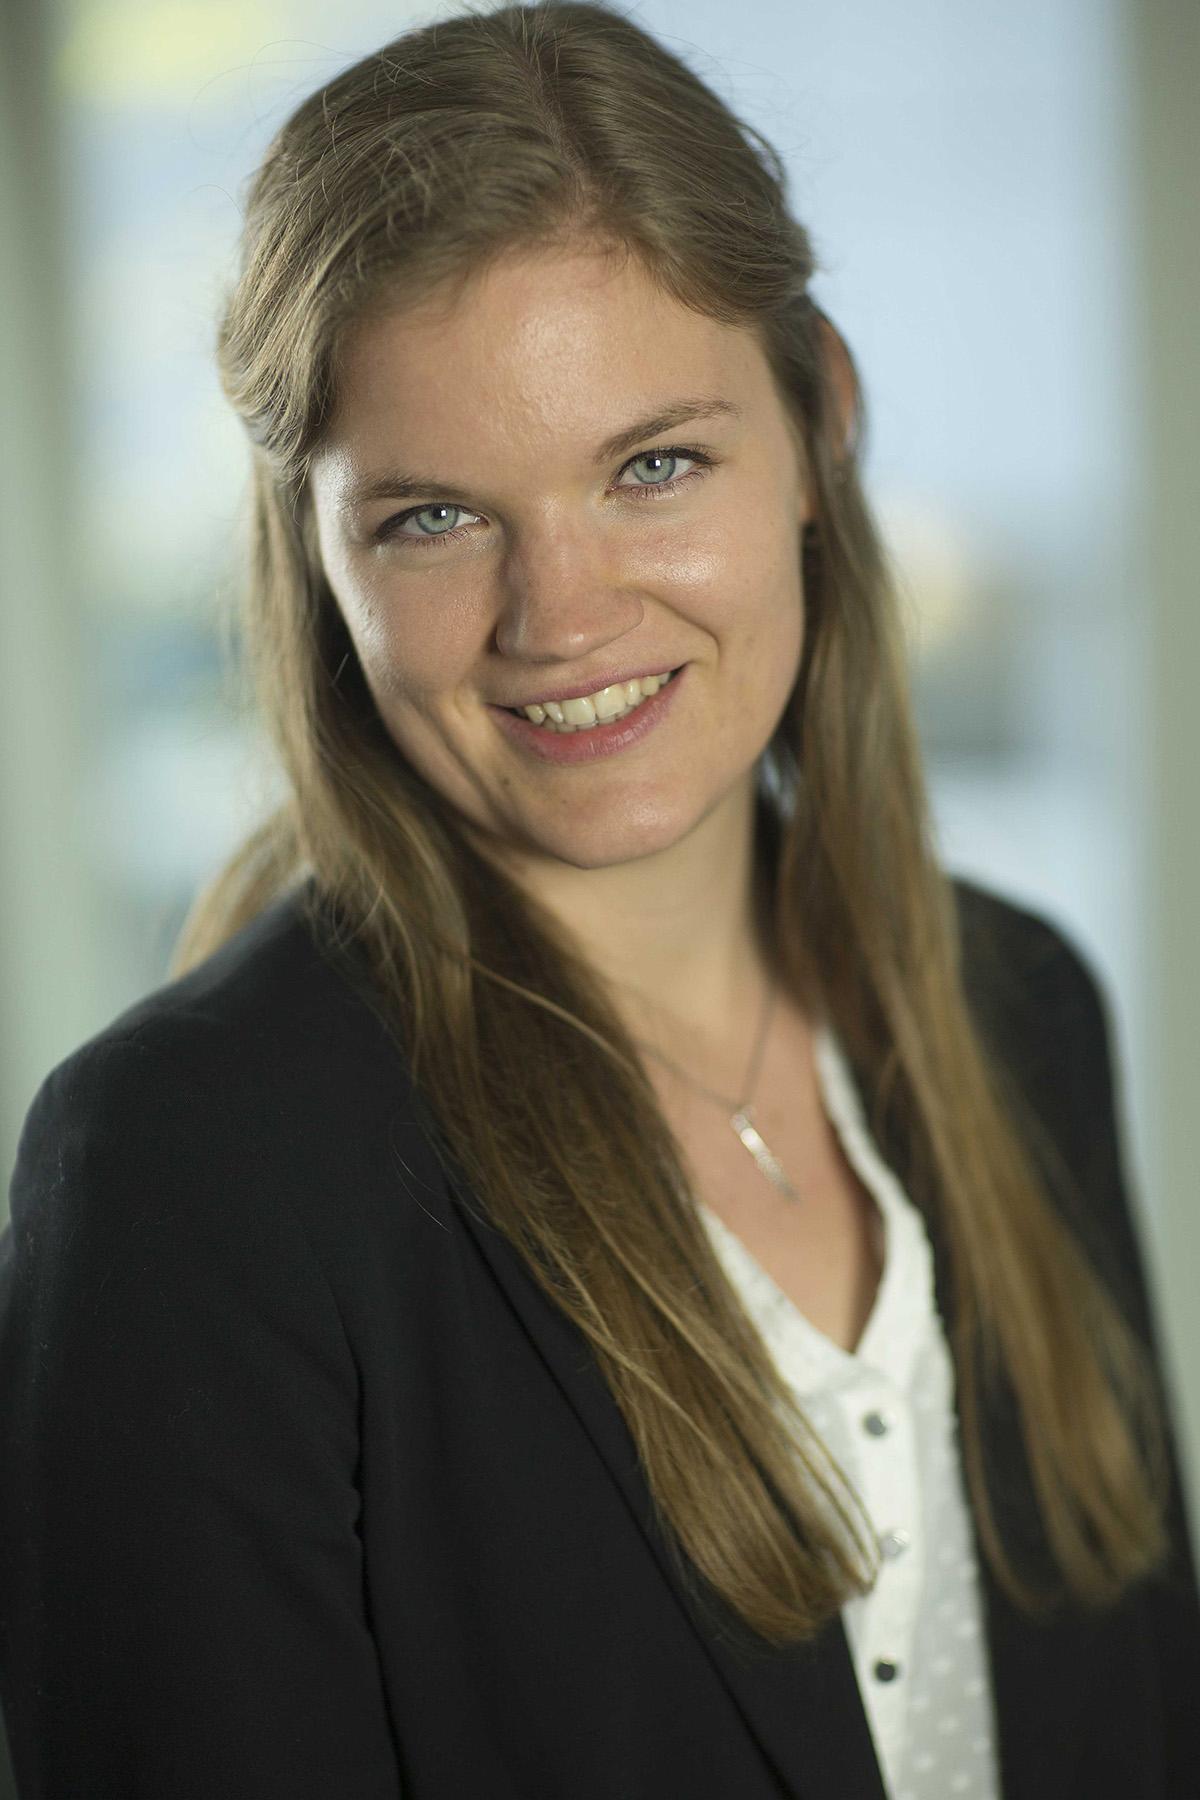 Dieuwertje Katelijn Modder